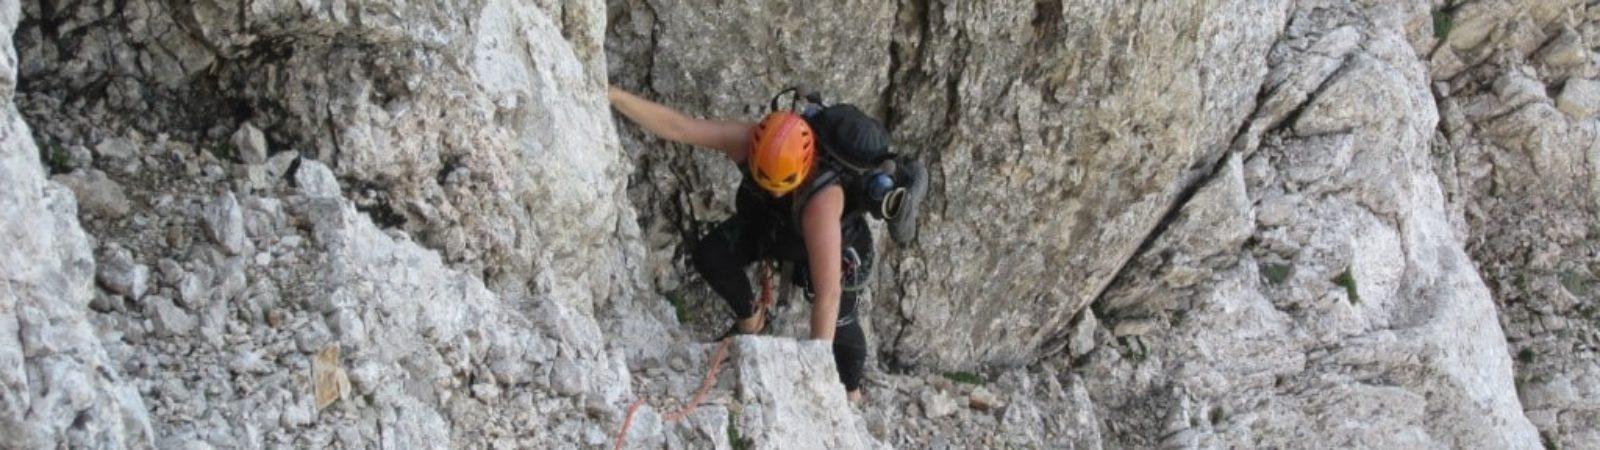 Mt Triglav North Face guided climb